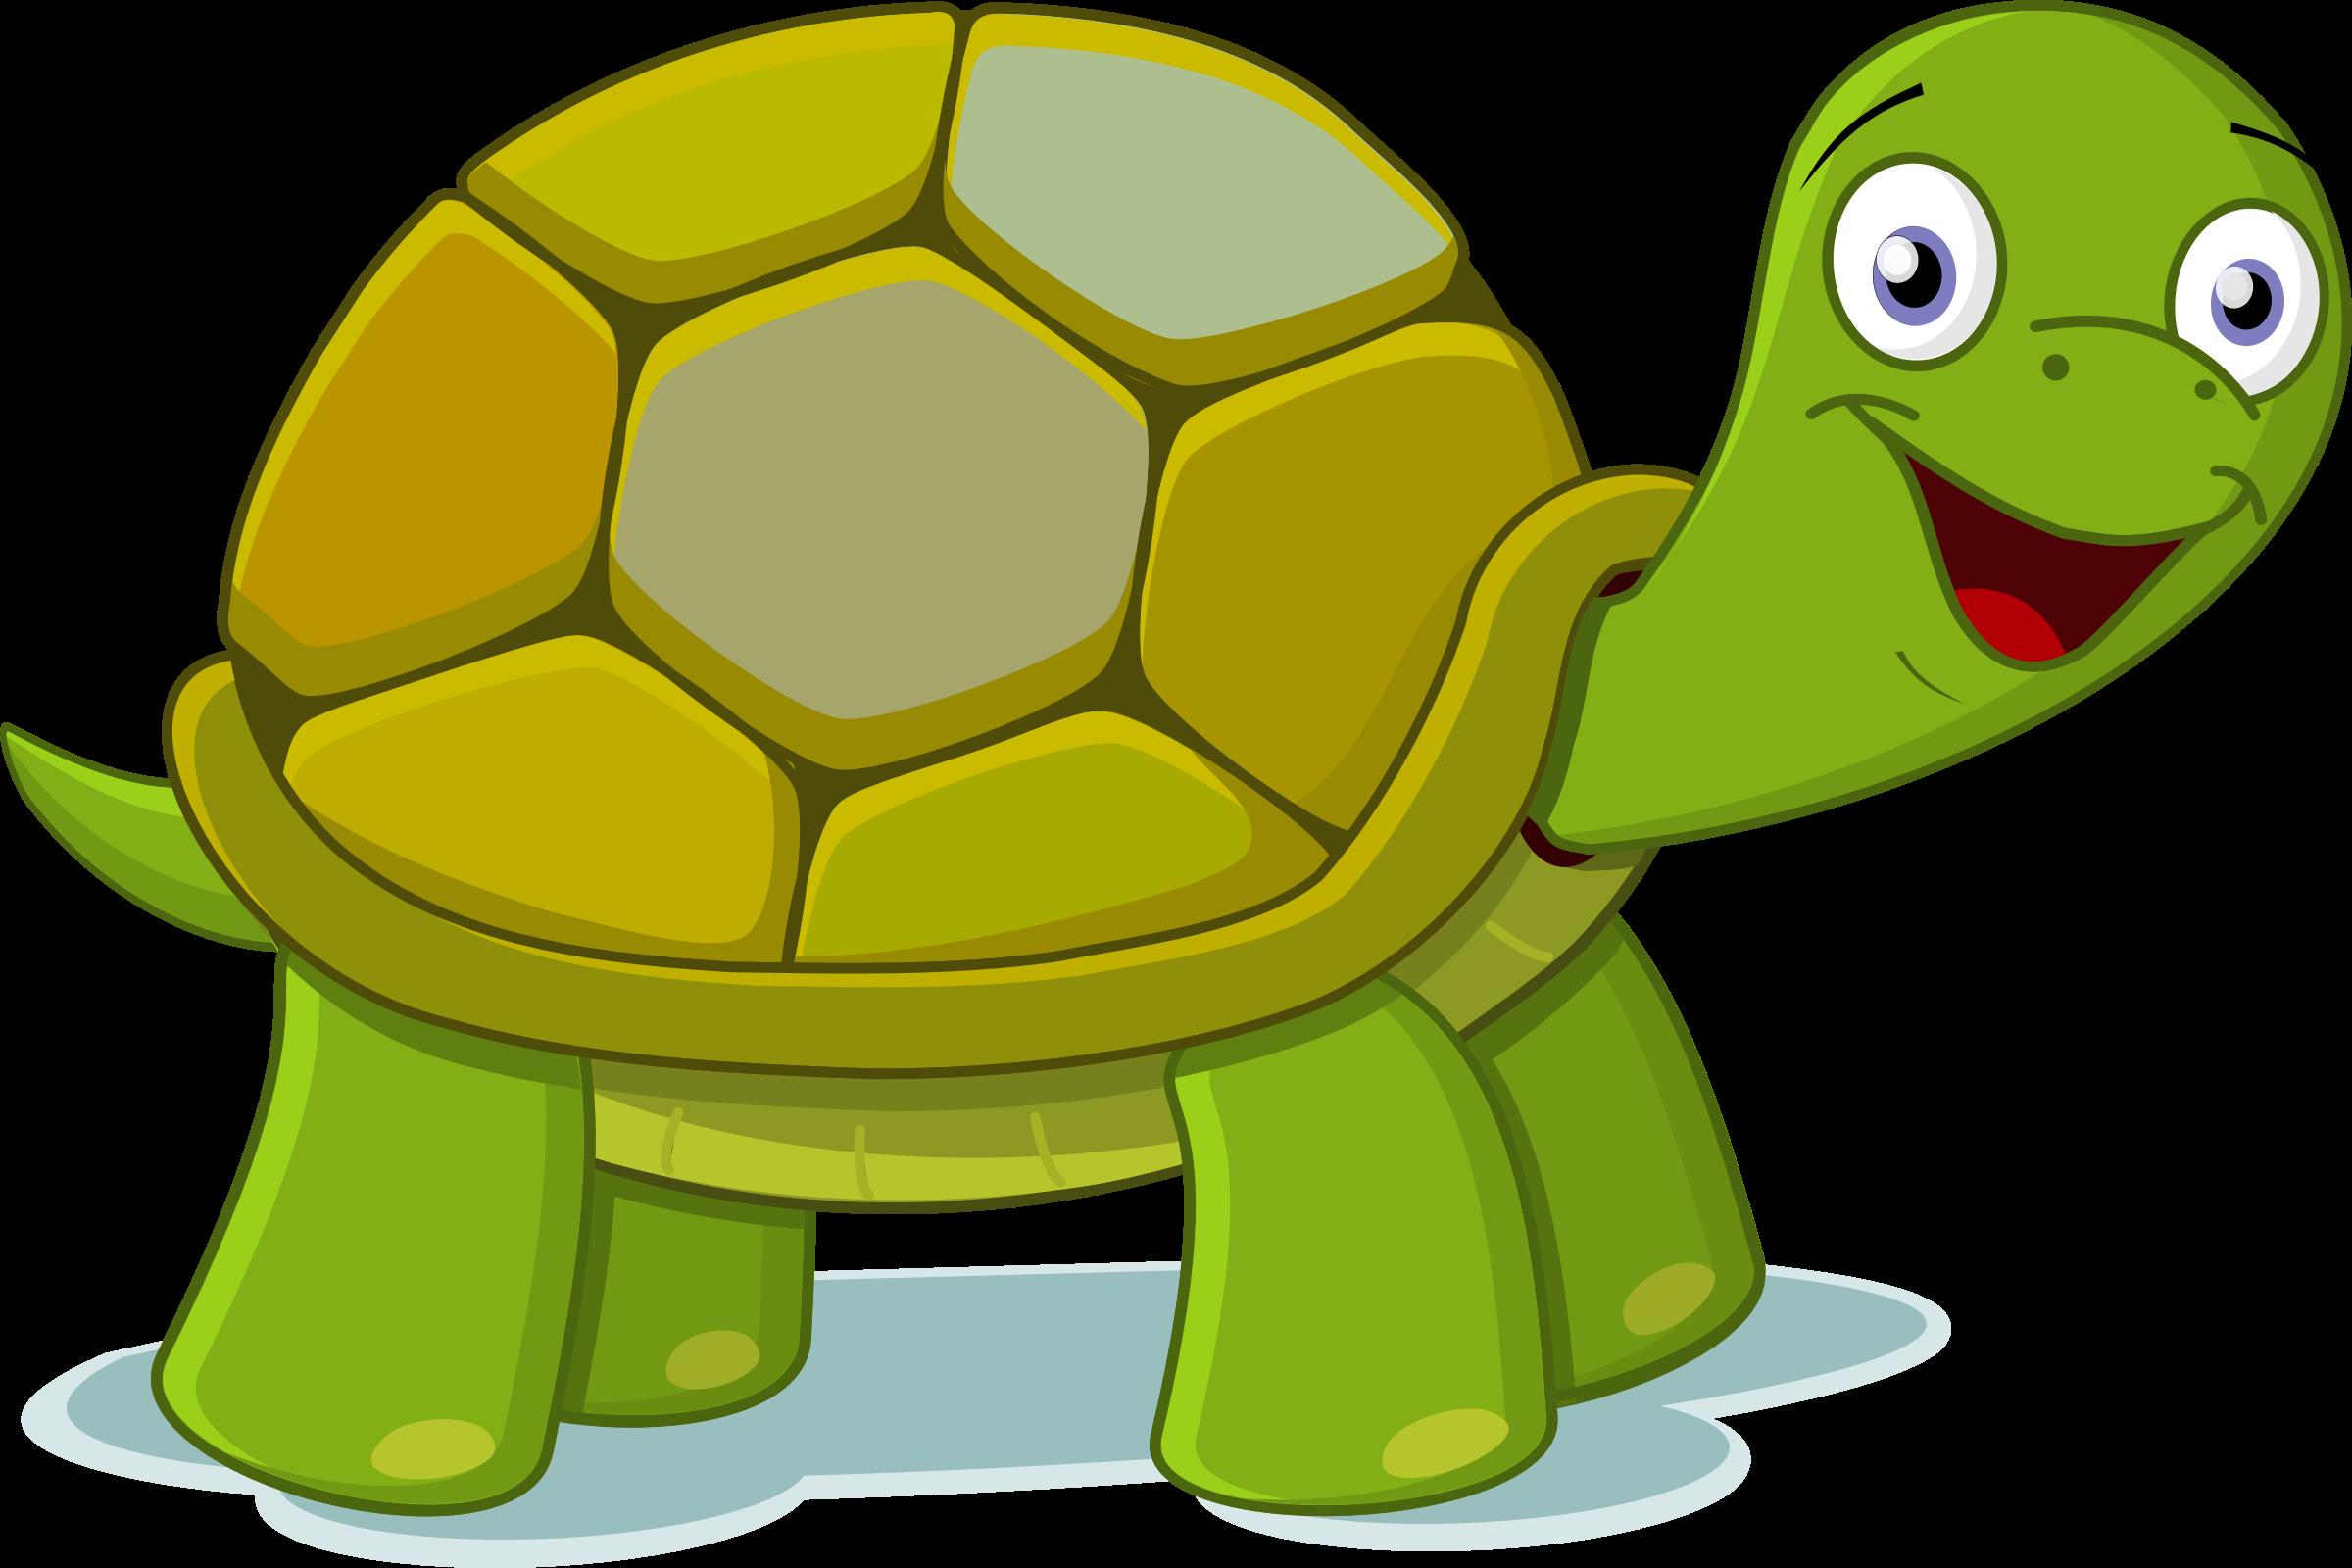 ninja turtle clipart at getdrawings com free for personal use rh getdrawings com turtle clip art cartoon turtle clip art cartoon